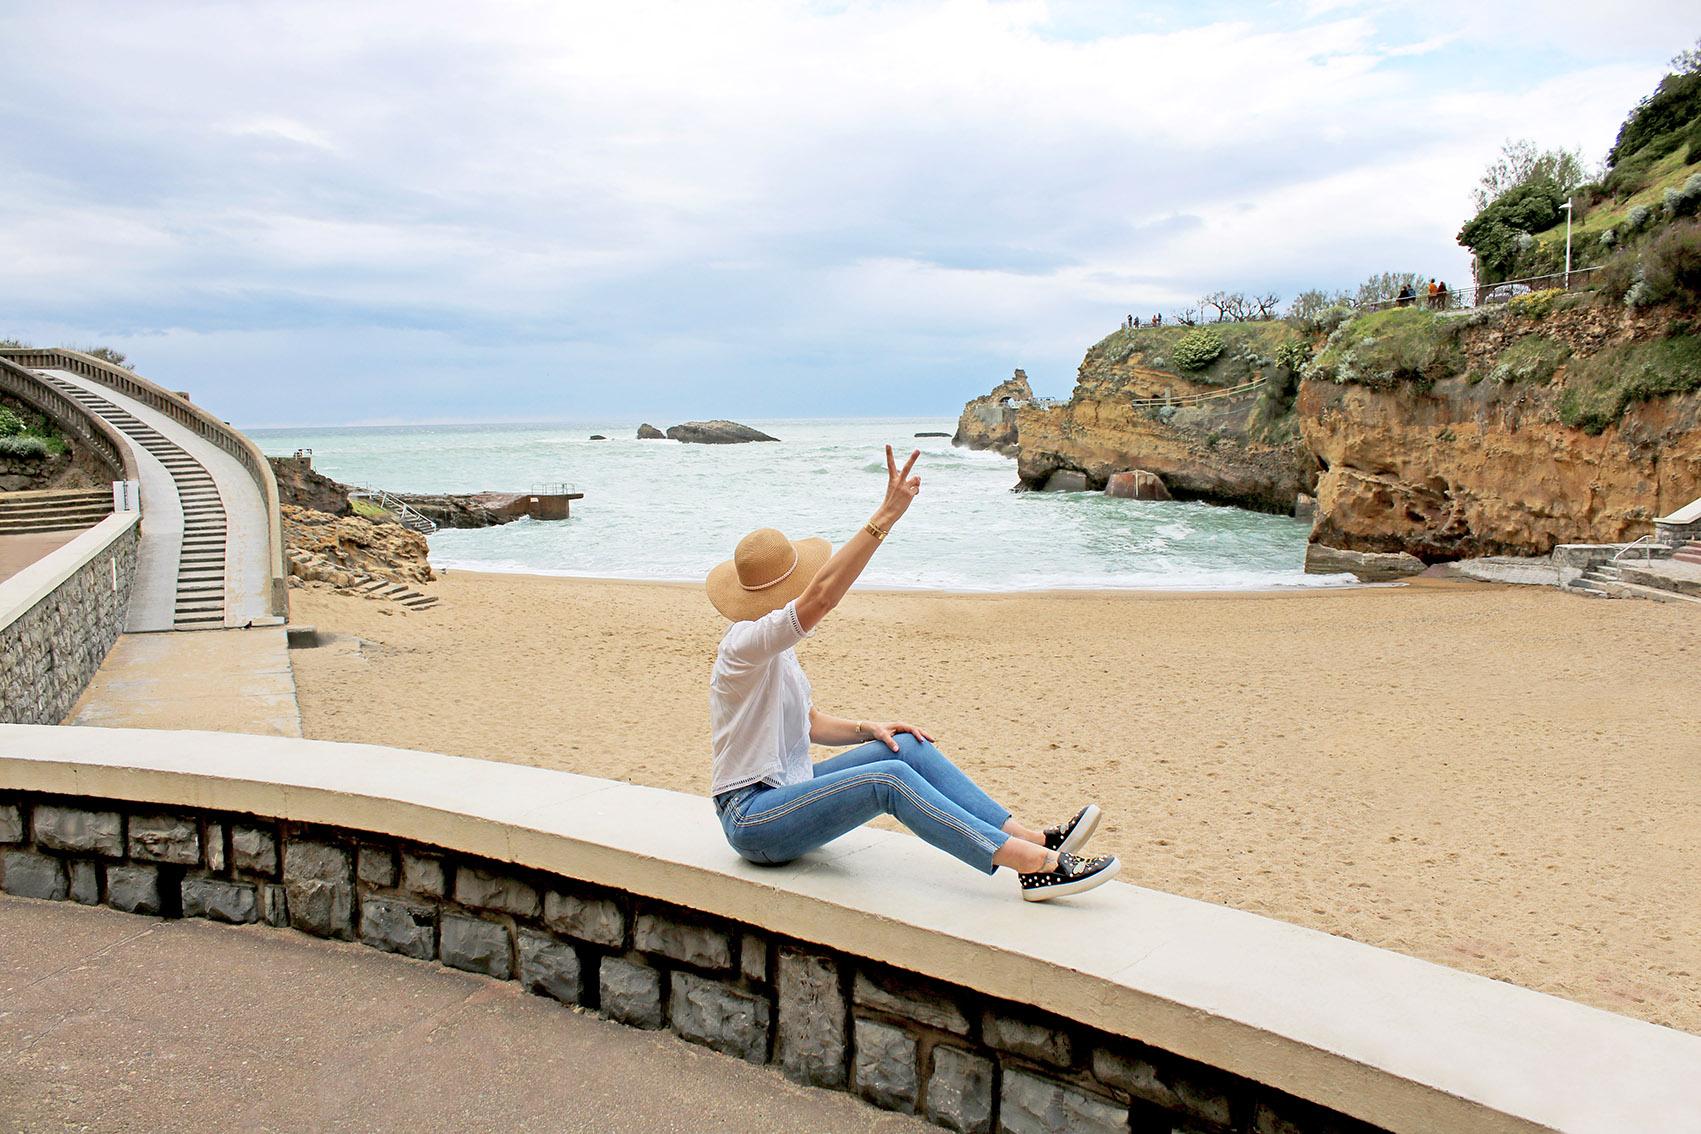 plage-biarritz-cote-basque